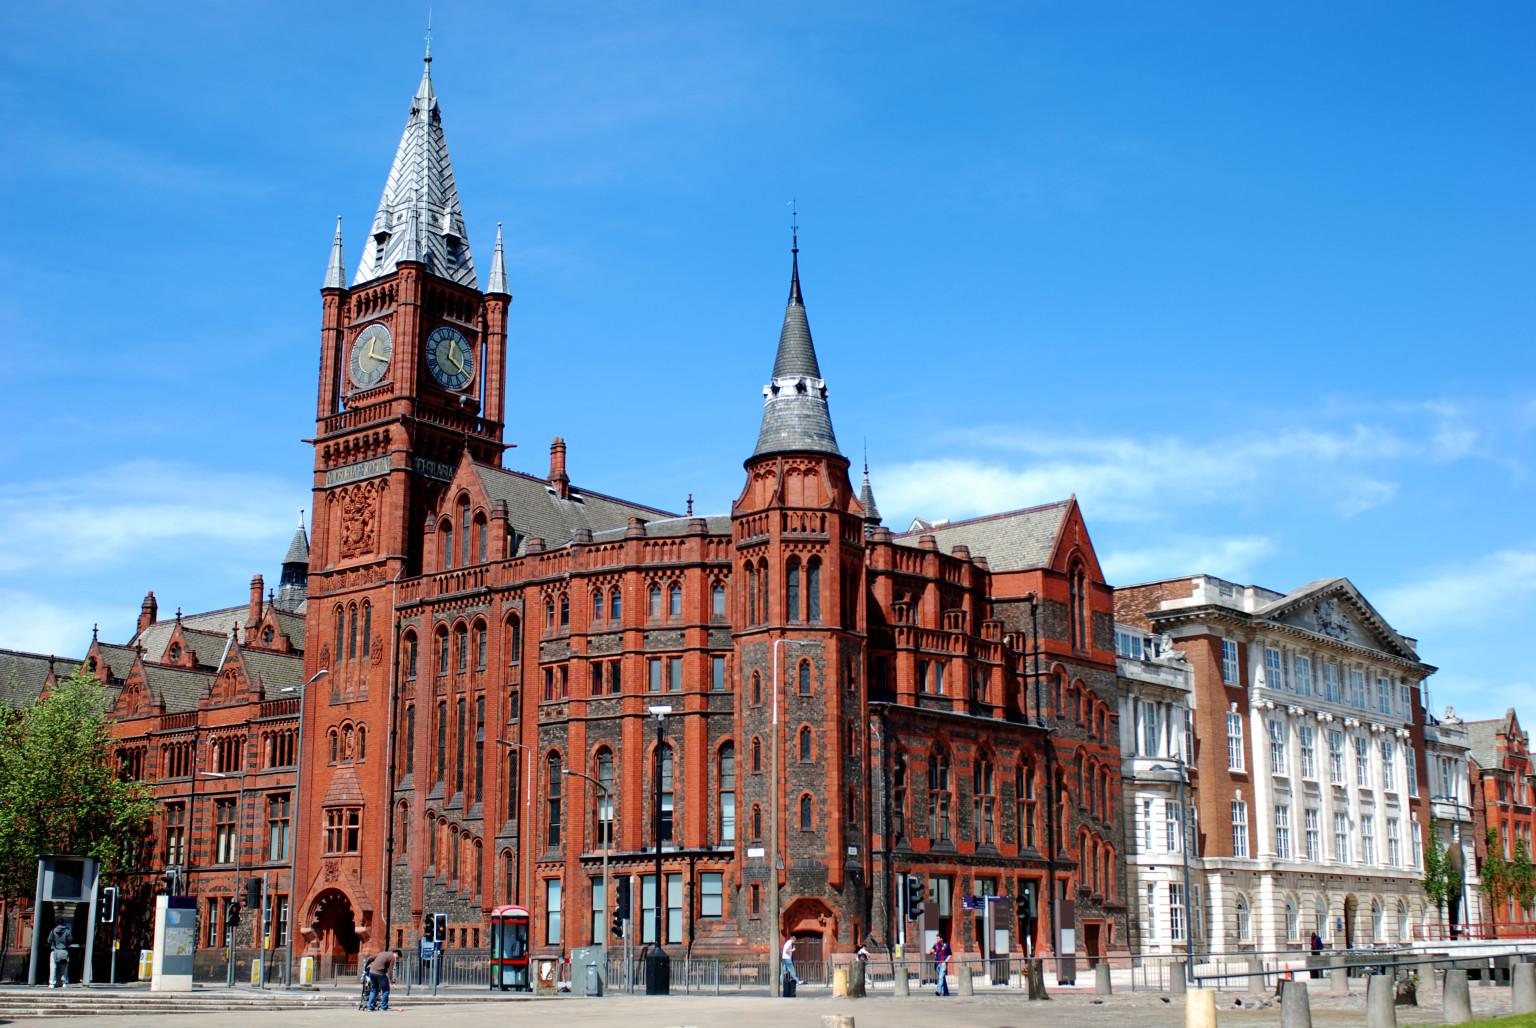 The University of Liverpool Victoria Building